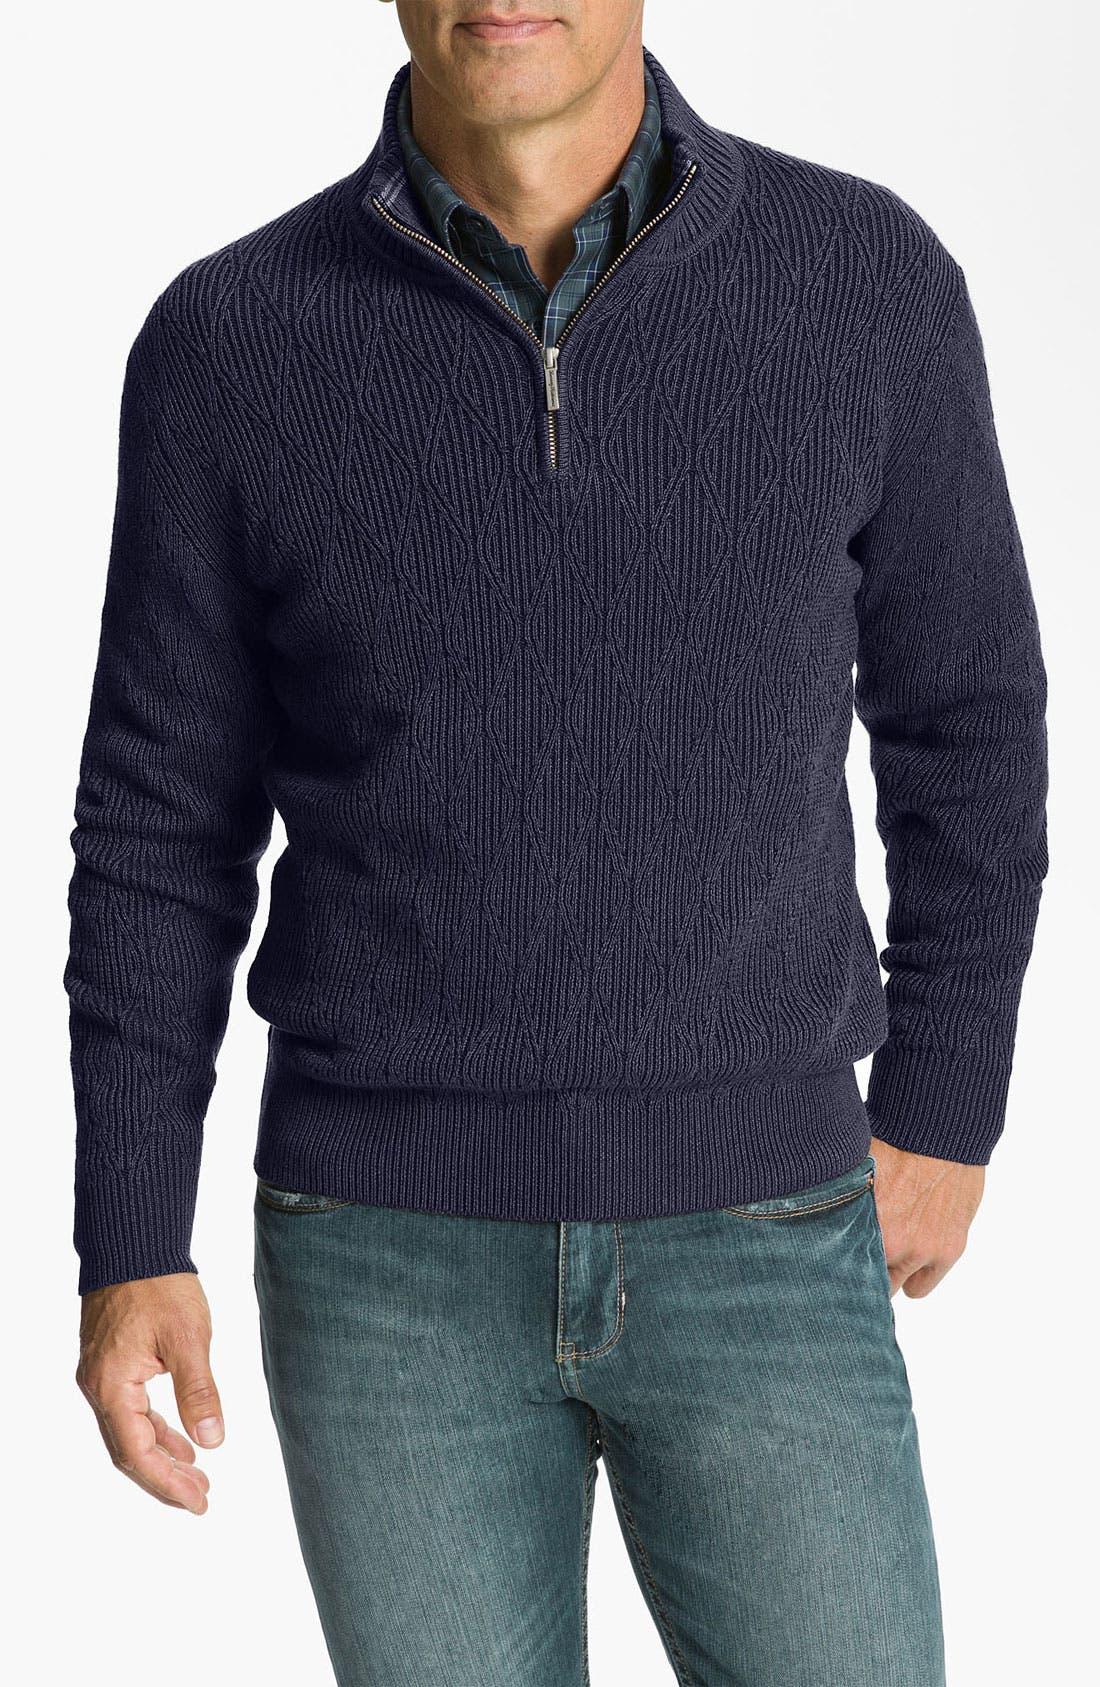 Alternate Image 1 Selected - Tommy Bahama 'Coastal Fairway' Half Zip Sweater